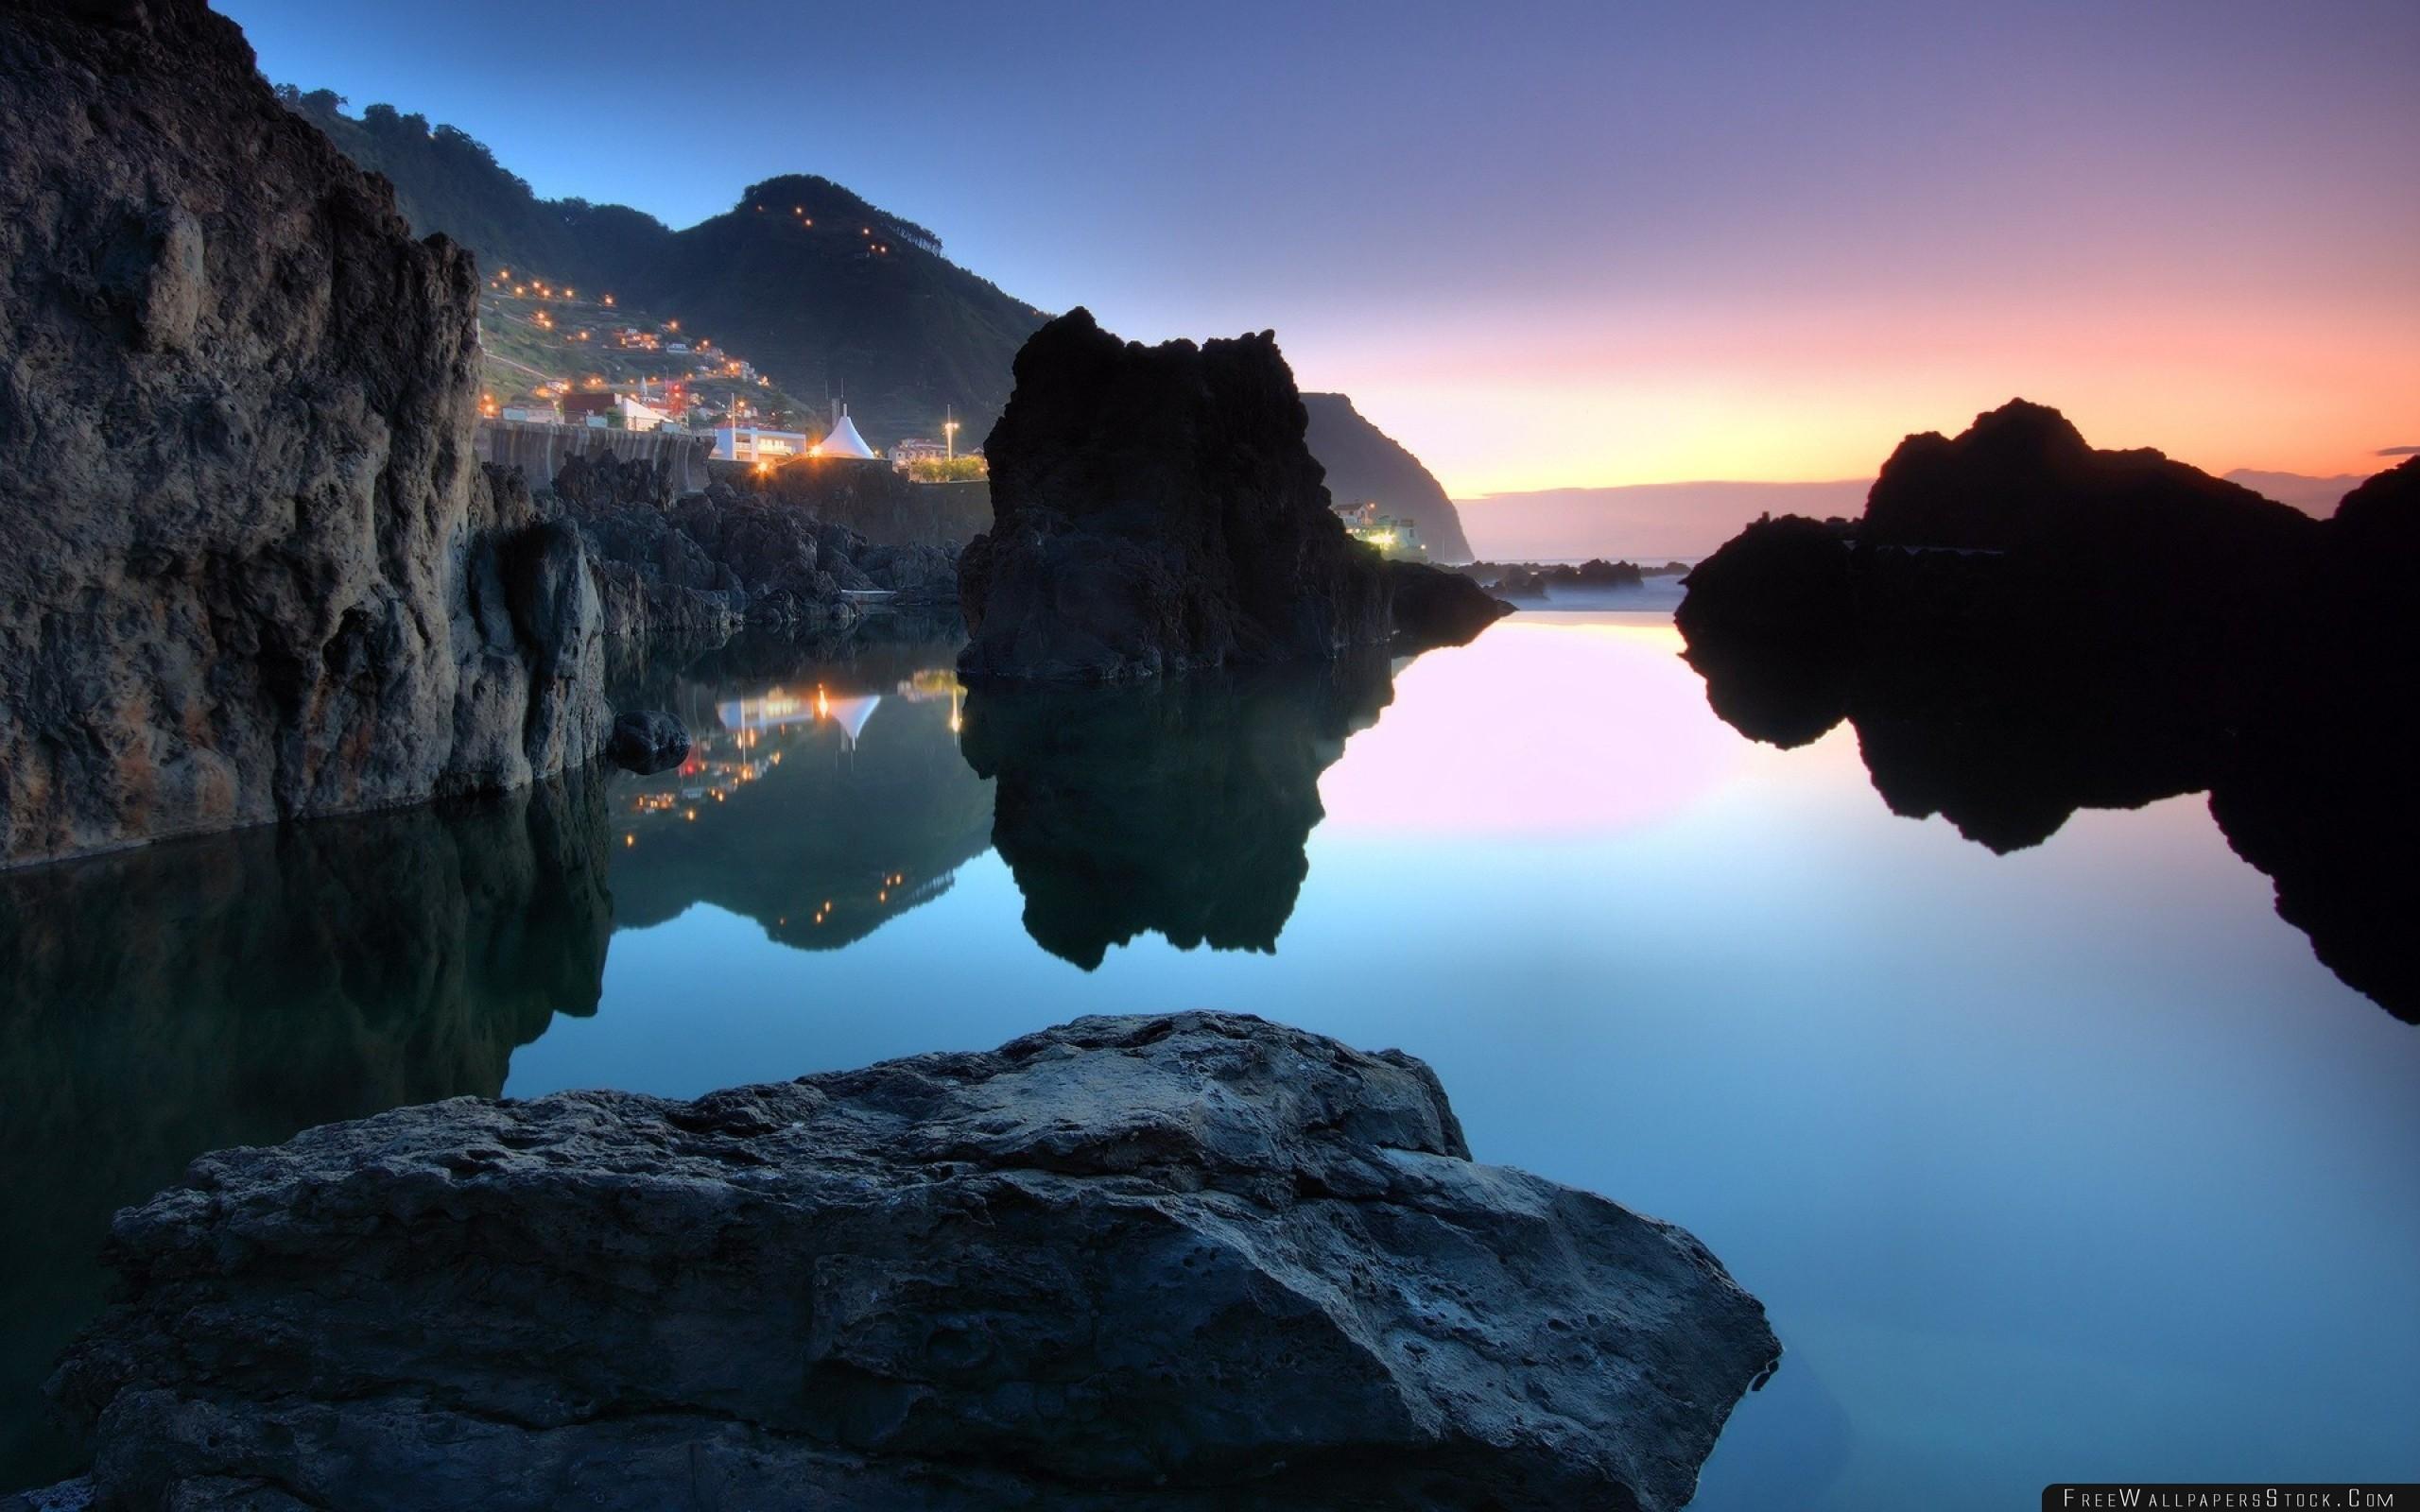 Download Free Wallpaper Stones Coast Rocks Fires Water Evening